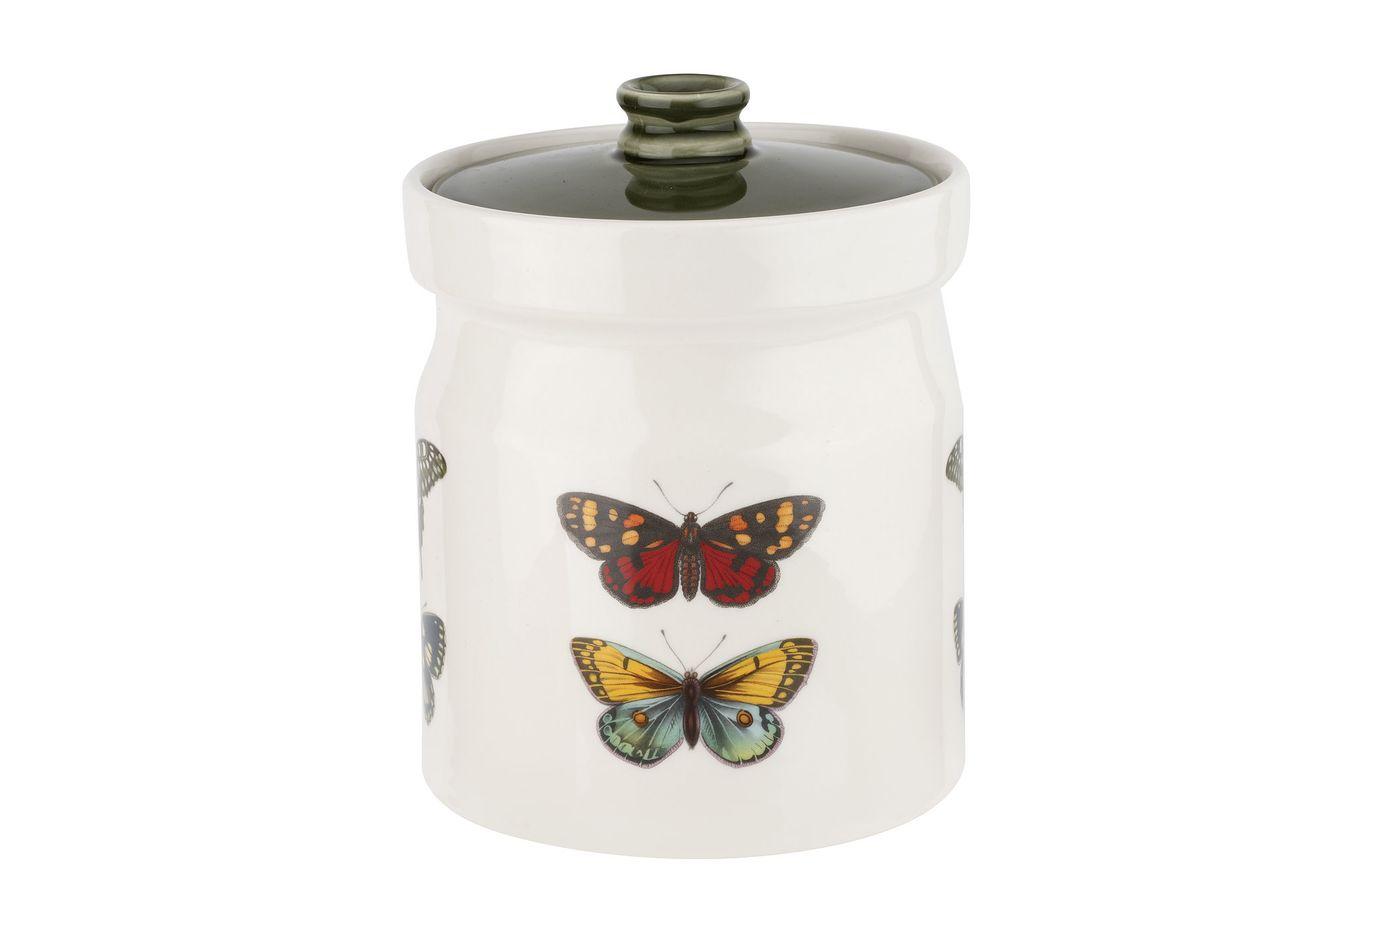 Portmeirion Botanic Garden Harmony Storage Jar + Lid 17.7cm thumb 1